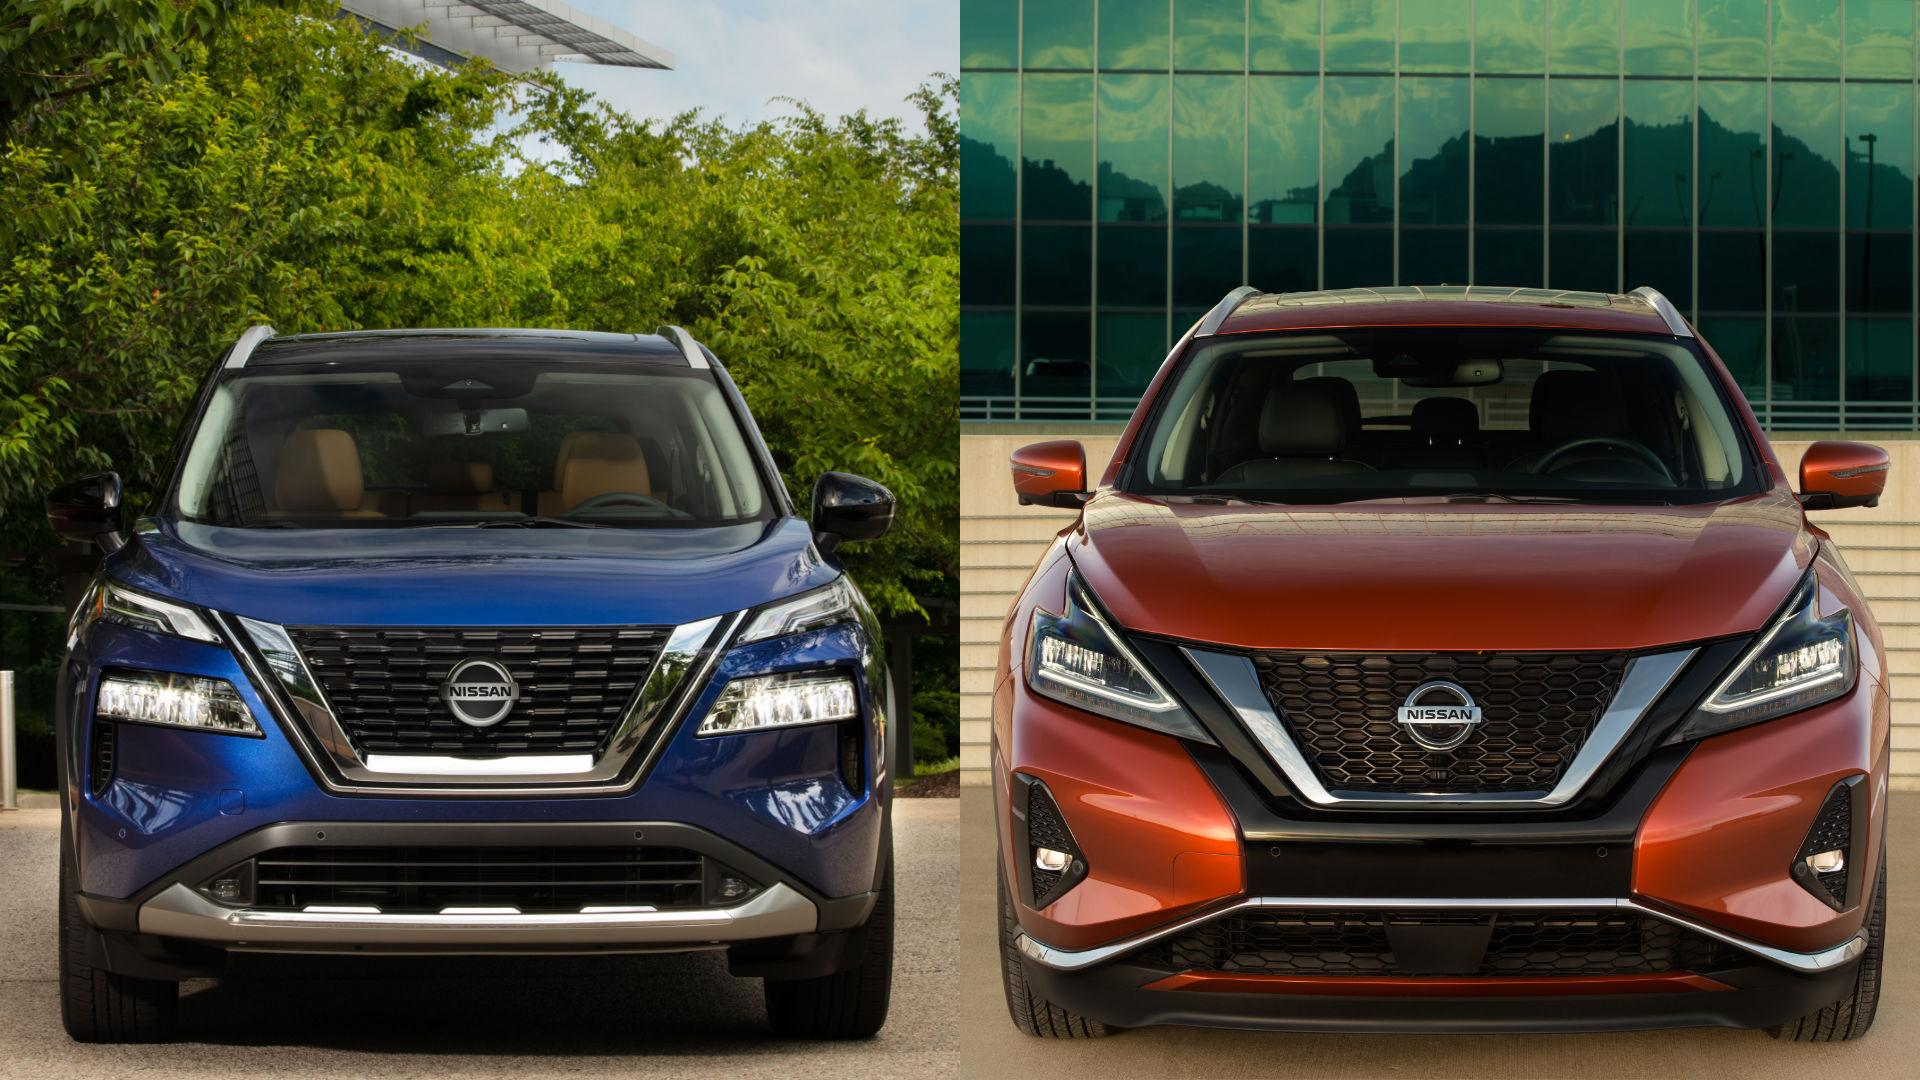 Nissan Rogue vs Murano